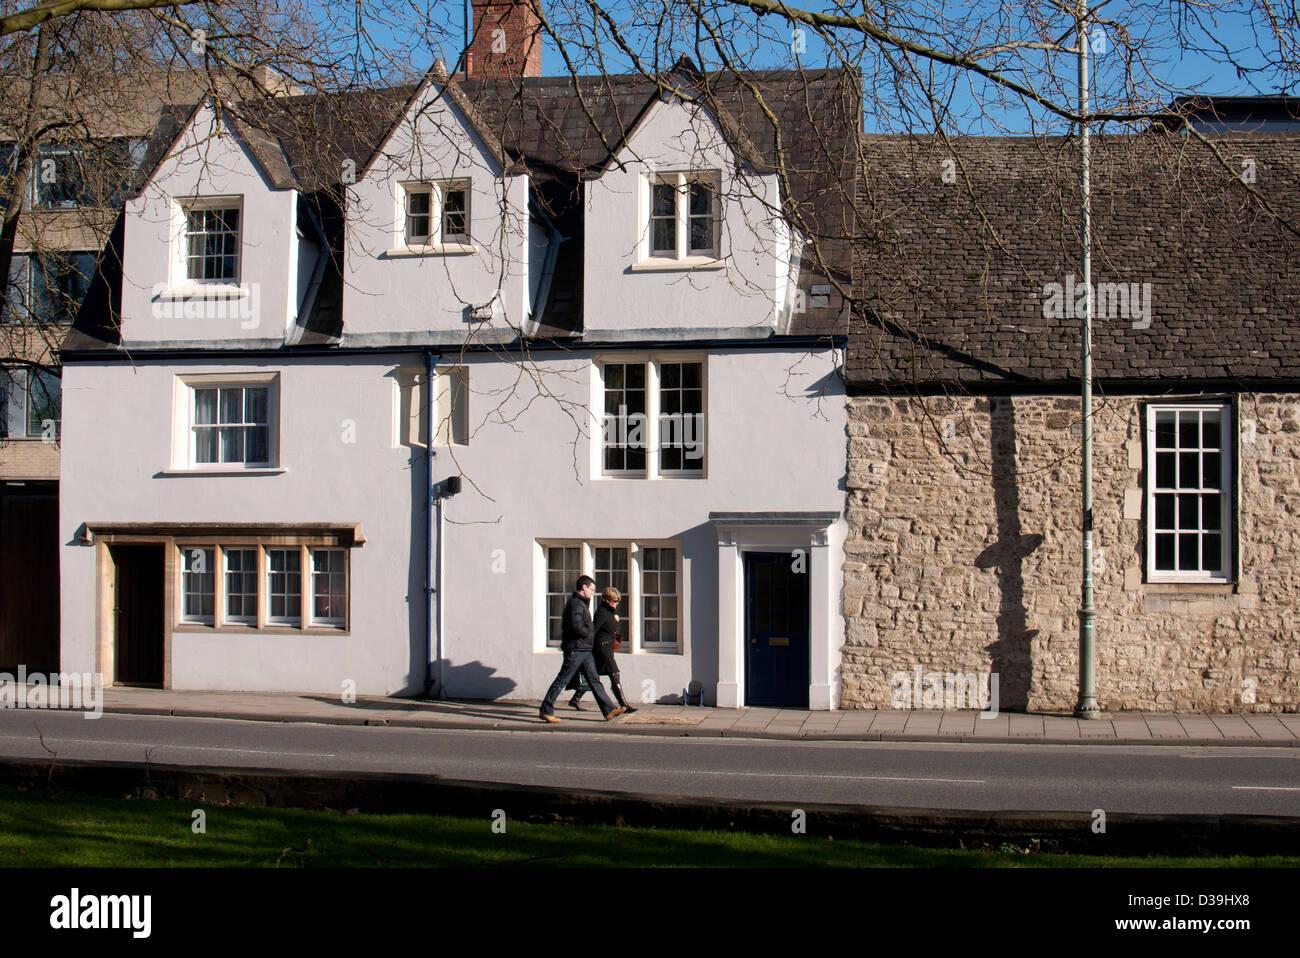 St. Giles, Oxford, UK - Stock Image